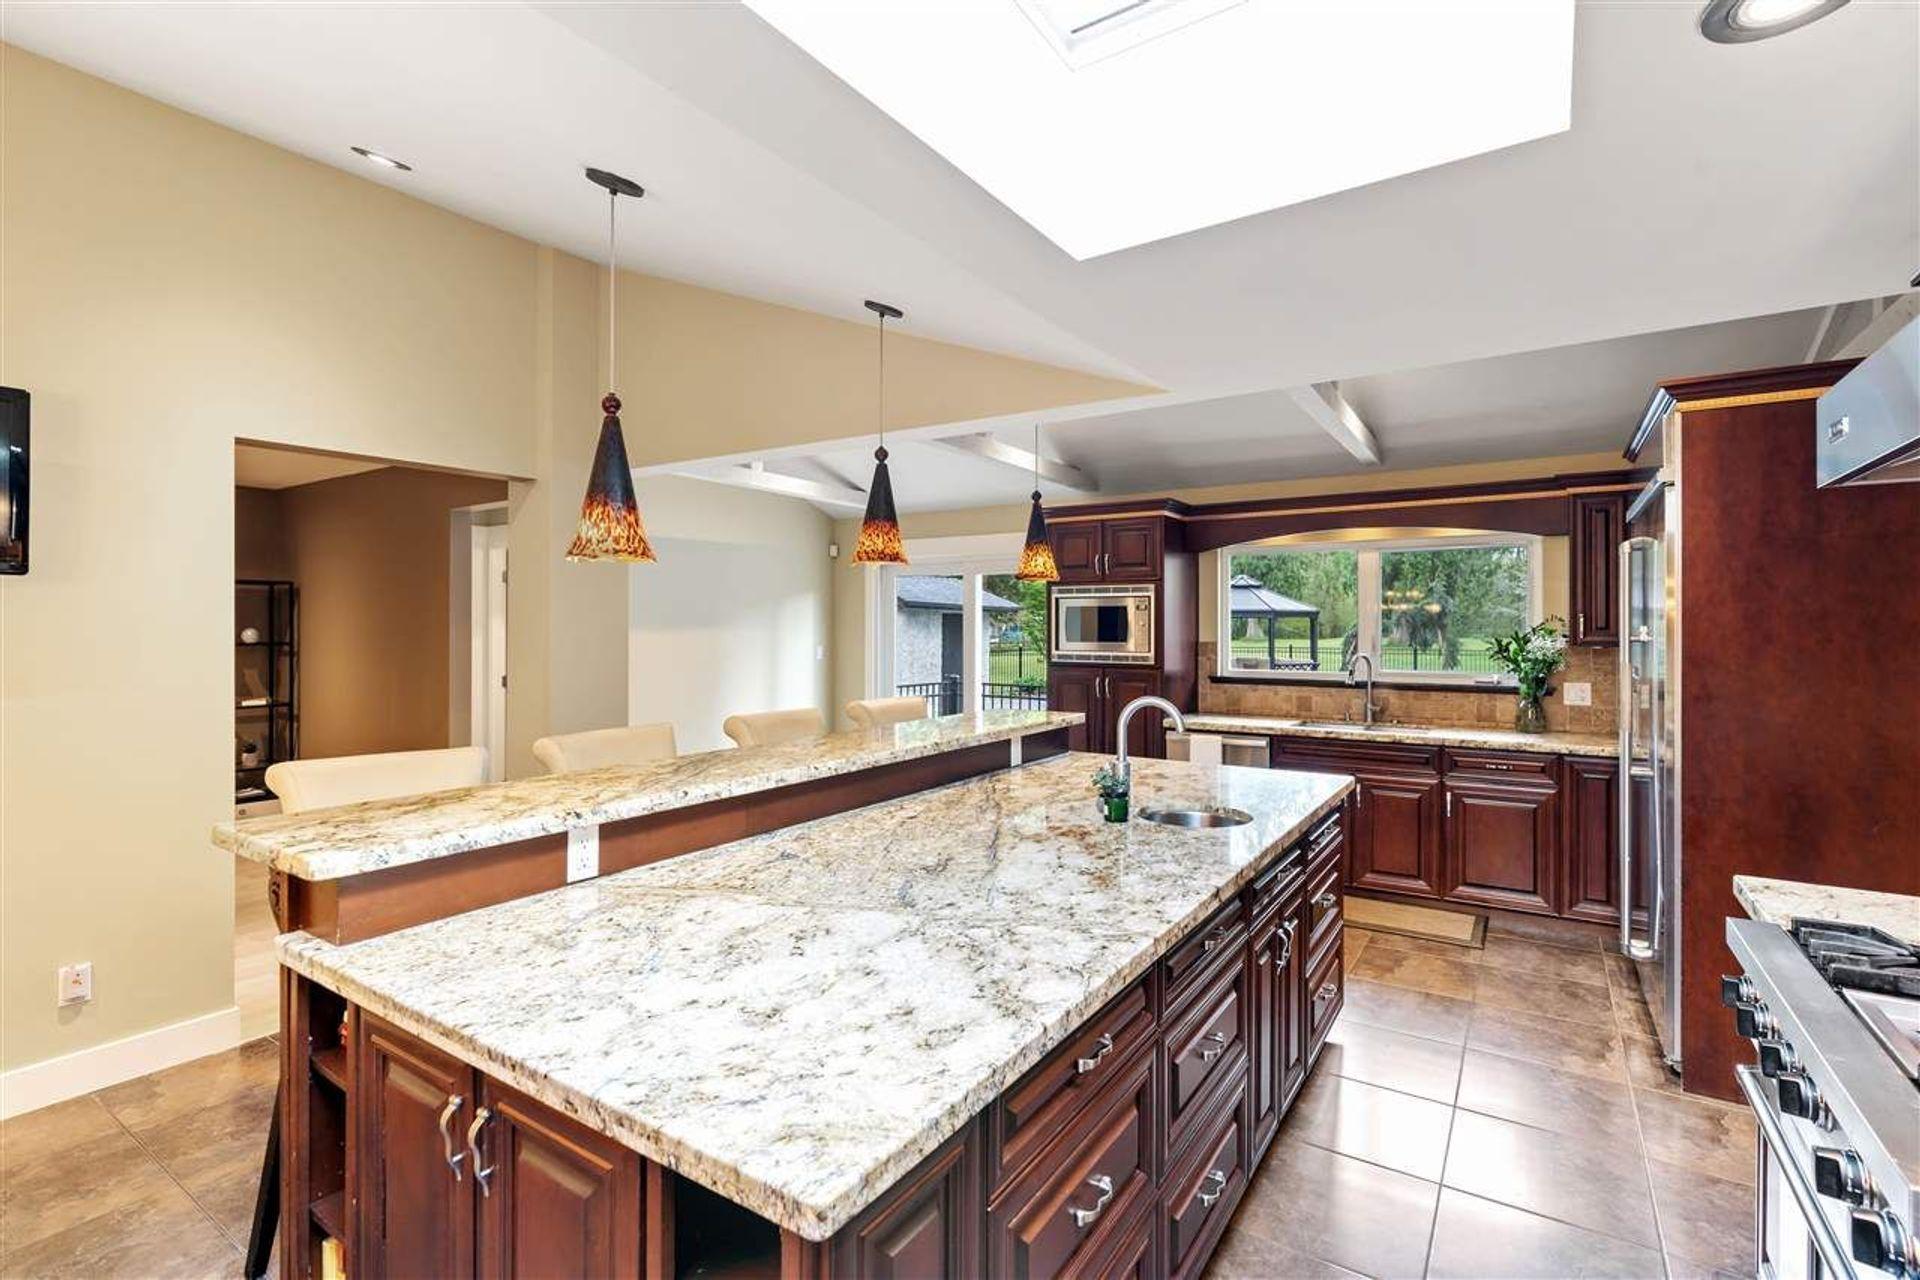 24852-ferguson-avenue-cottonwood-mr-maple-ridge-15 of 24852 Ferguson Avenue, Cottonwood MR, Maple Ridge